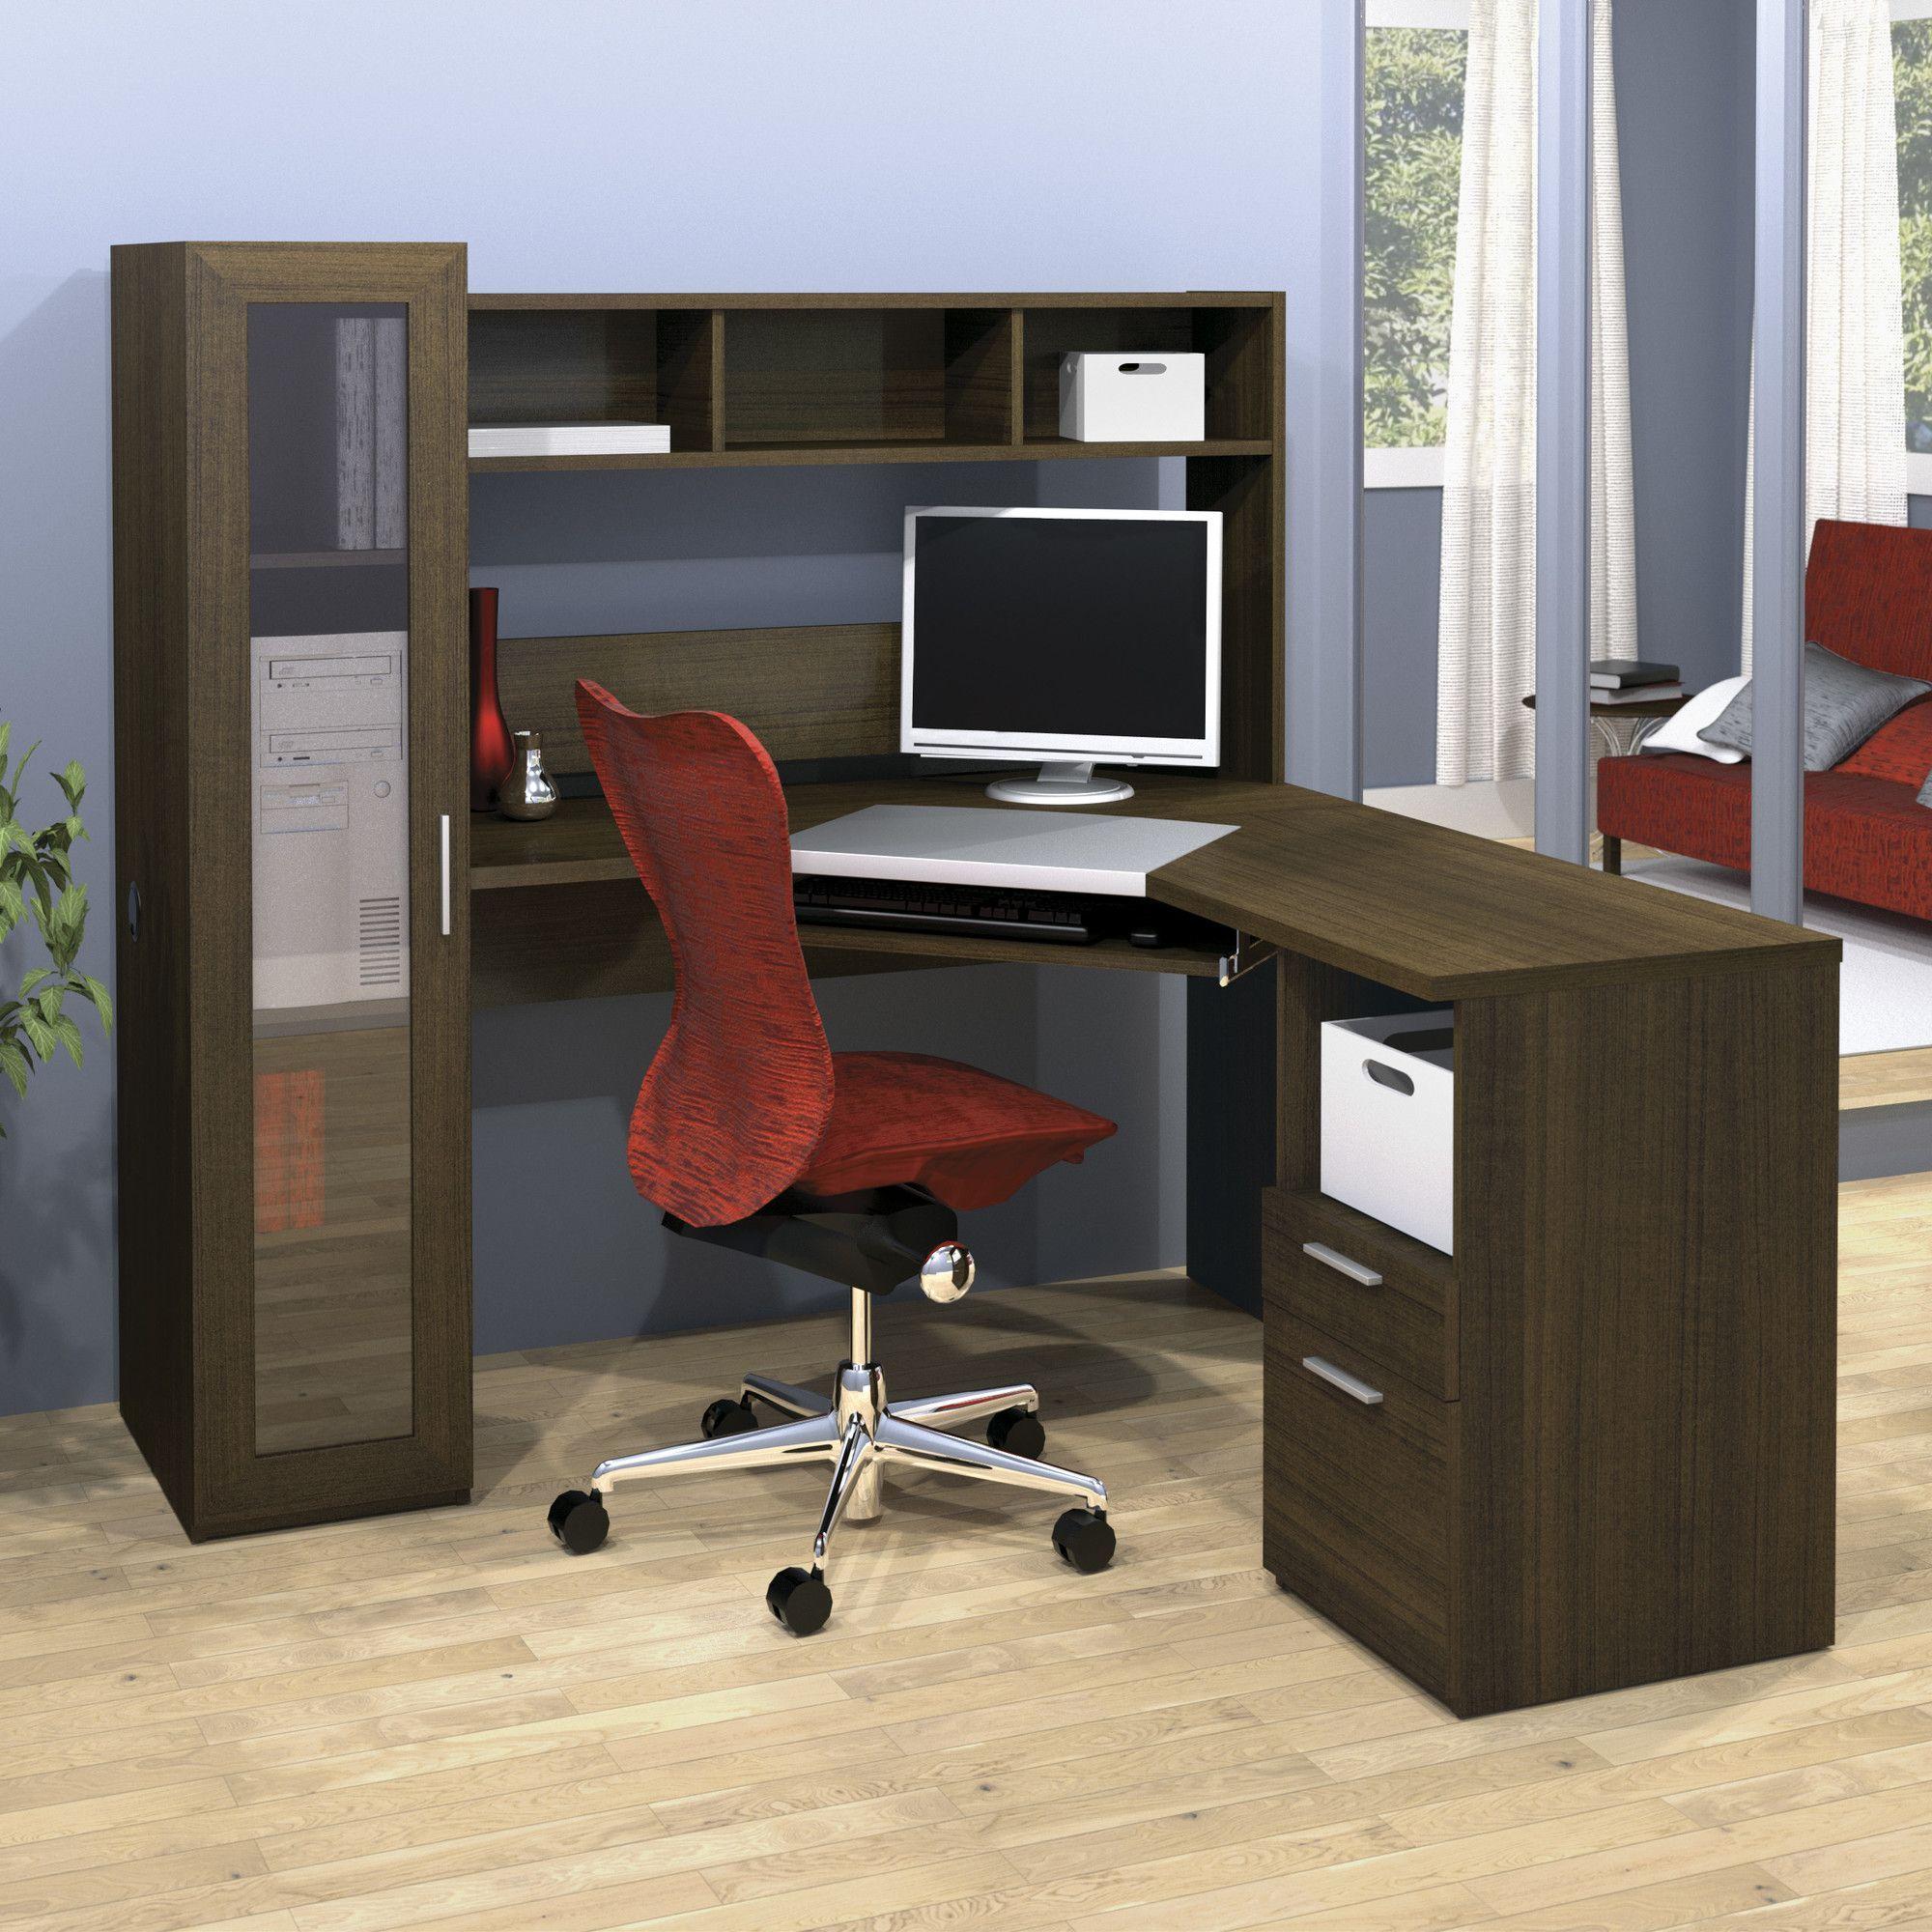 Jazz Corner Computer Desk with Hutch & Cabinet